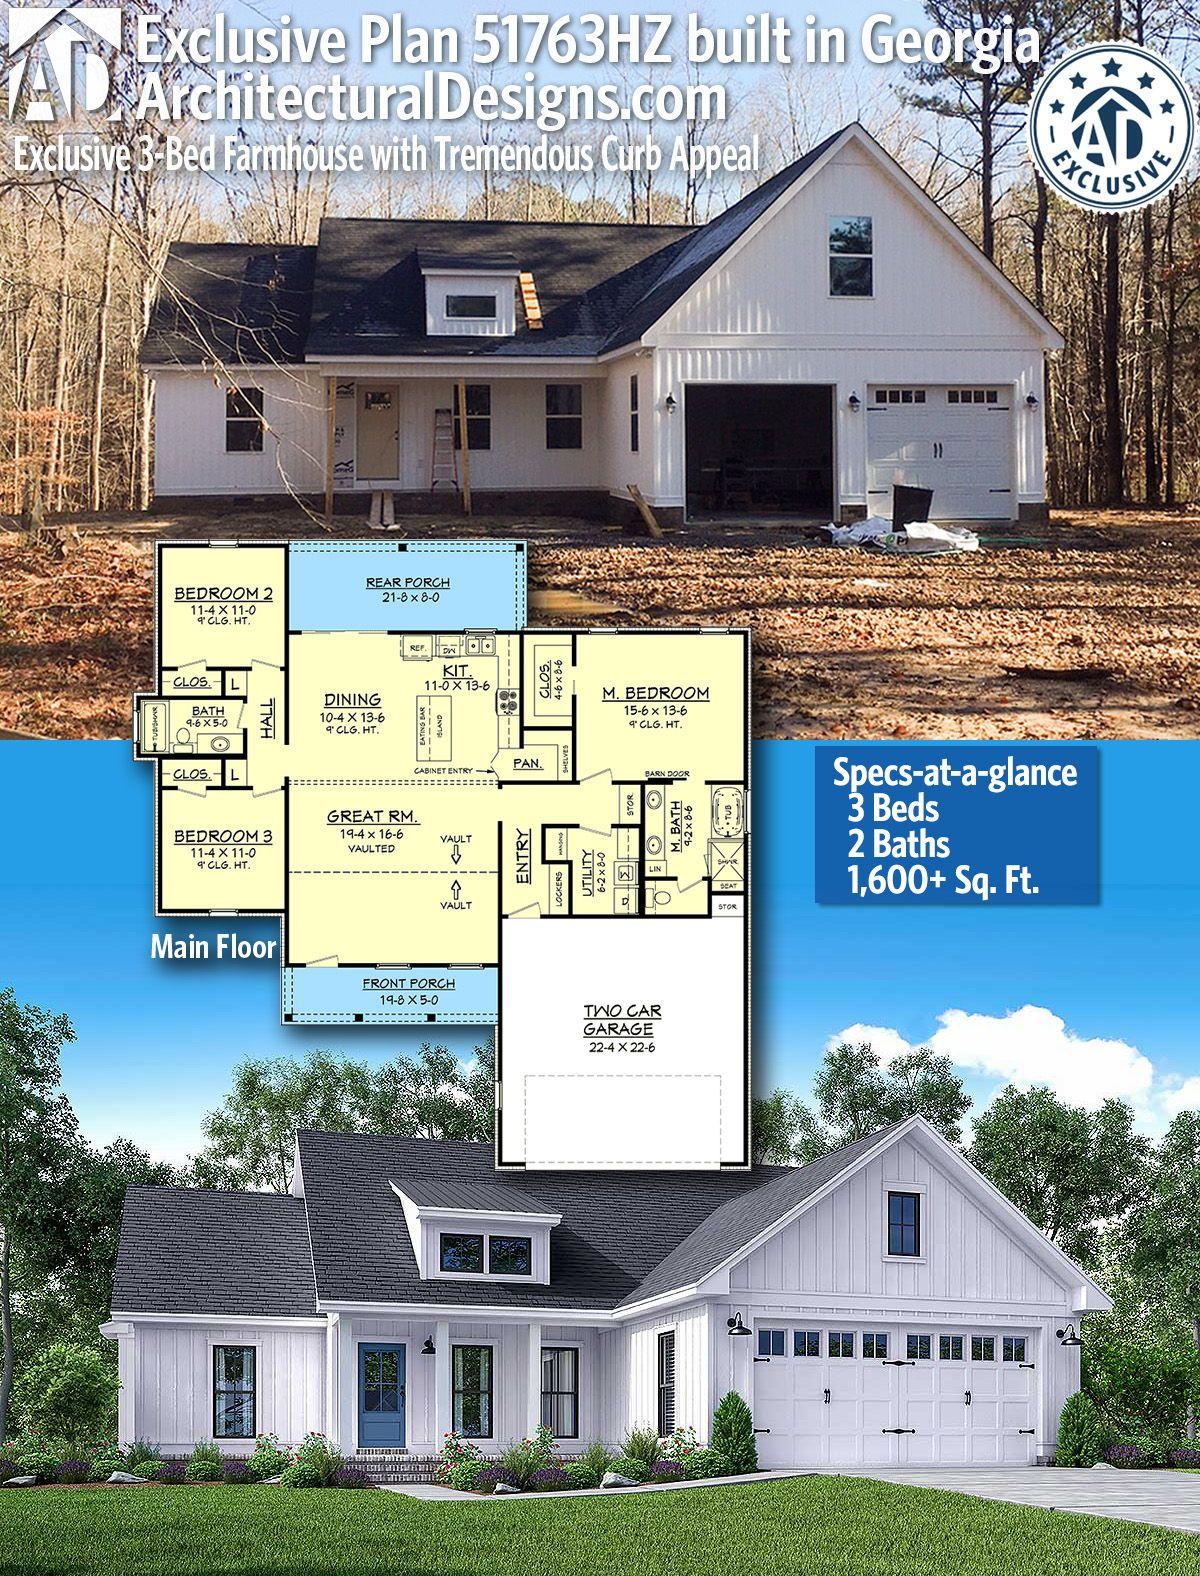 Plan 51763hz Exclusive 3 Bed Farmhouse With Tremendous